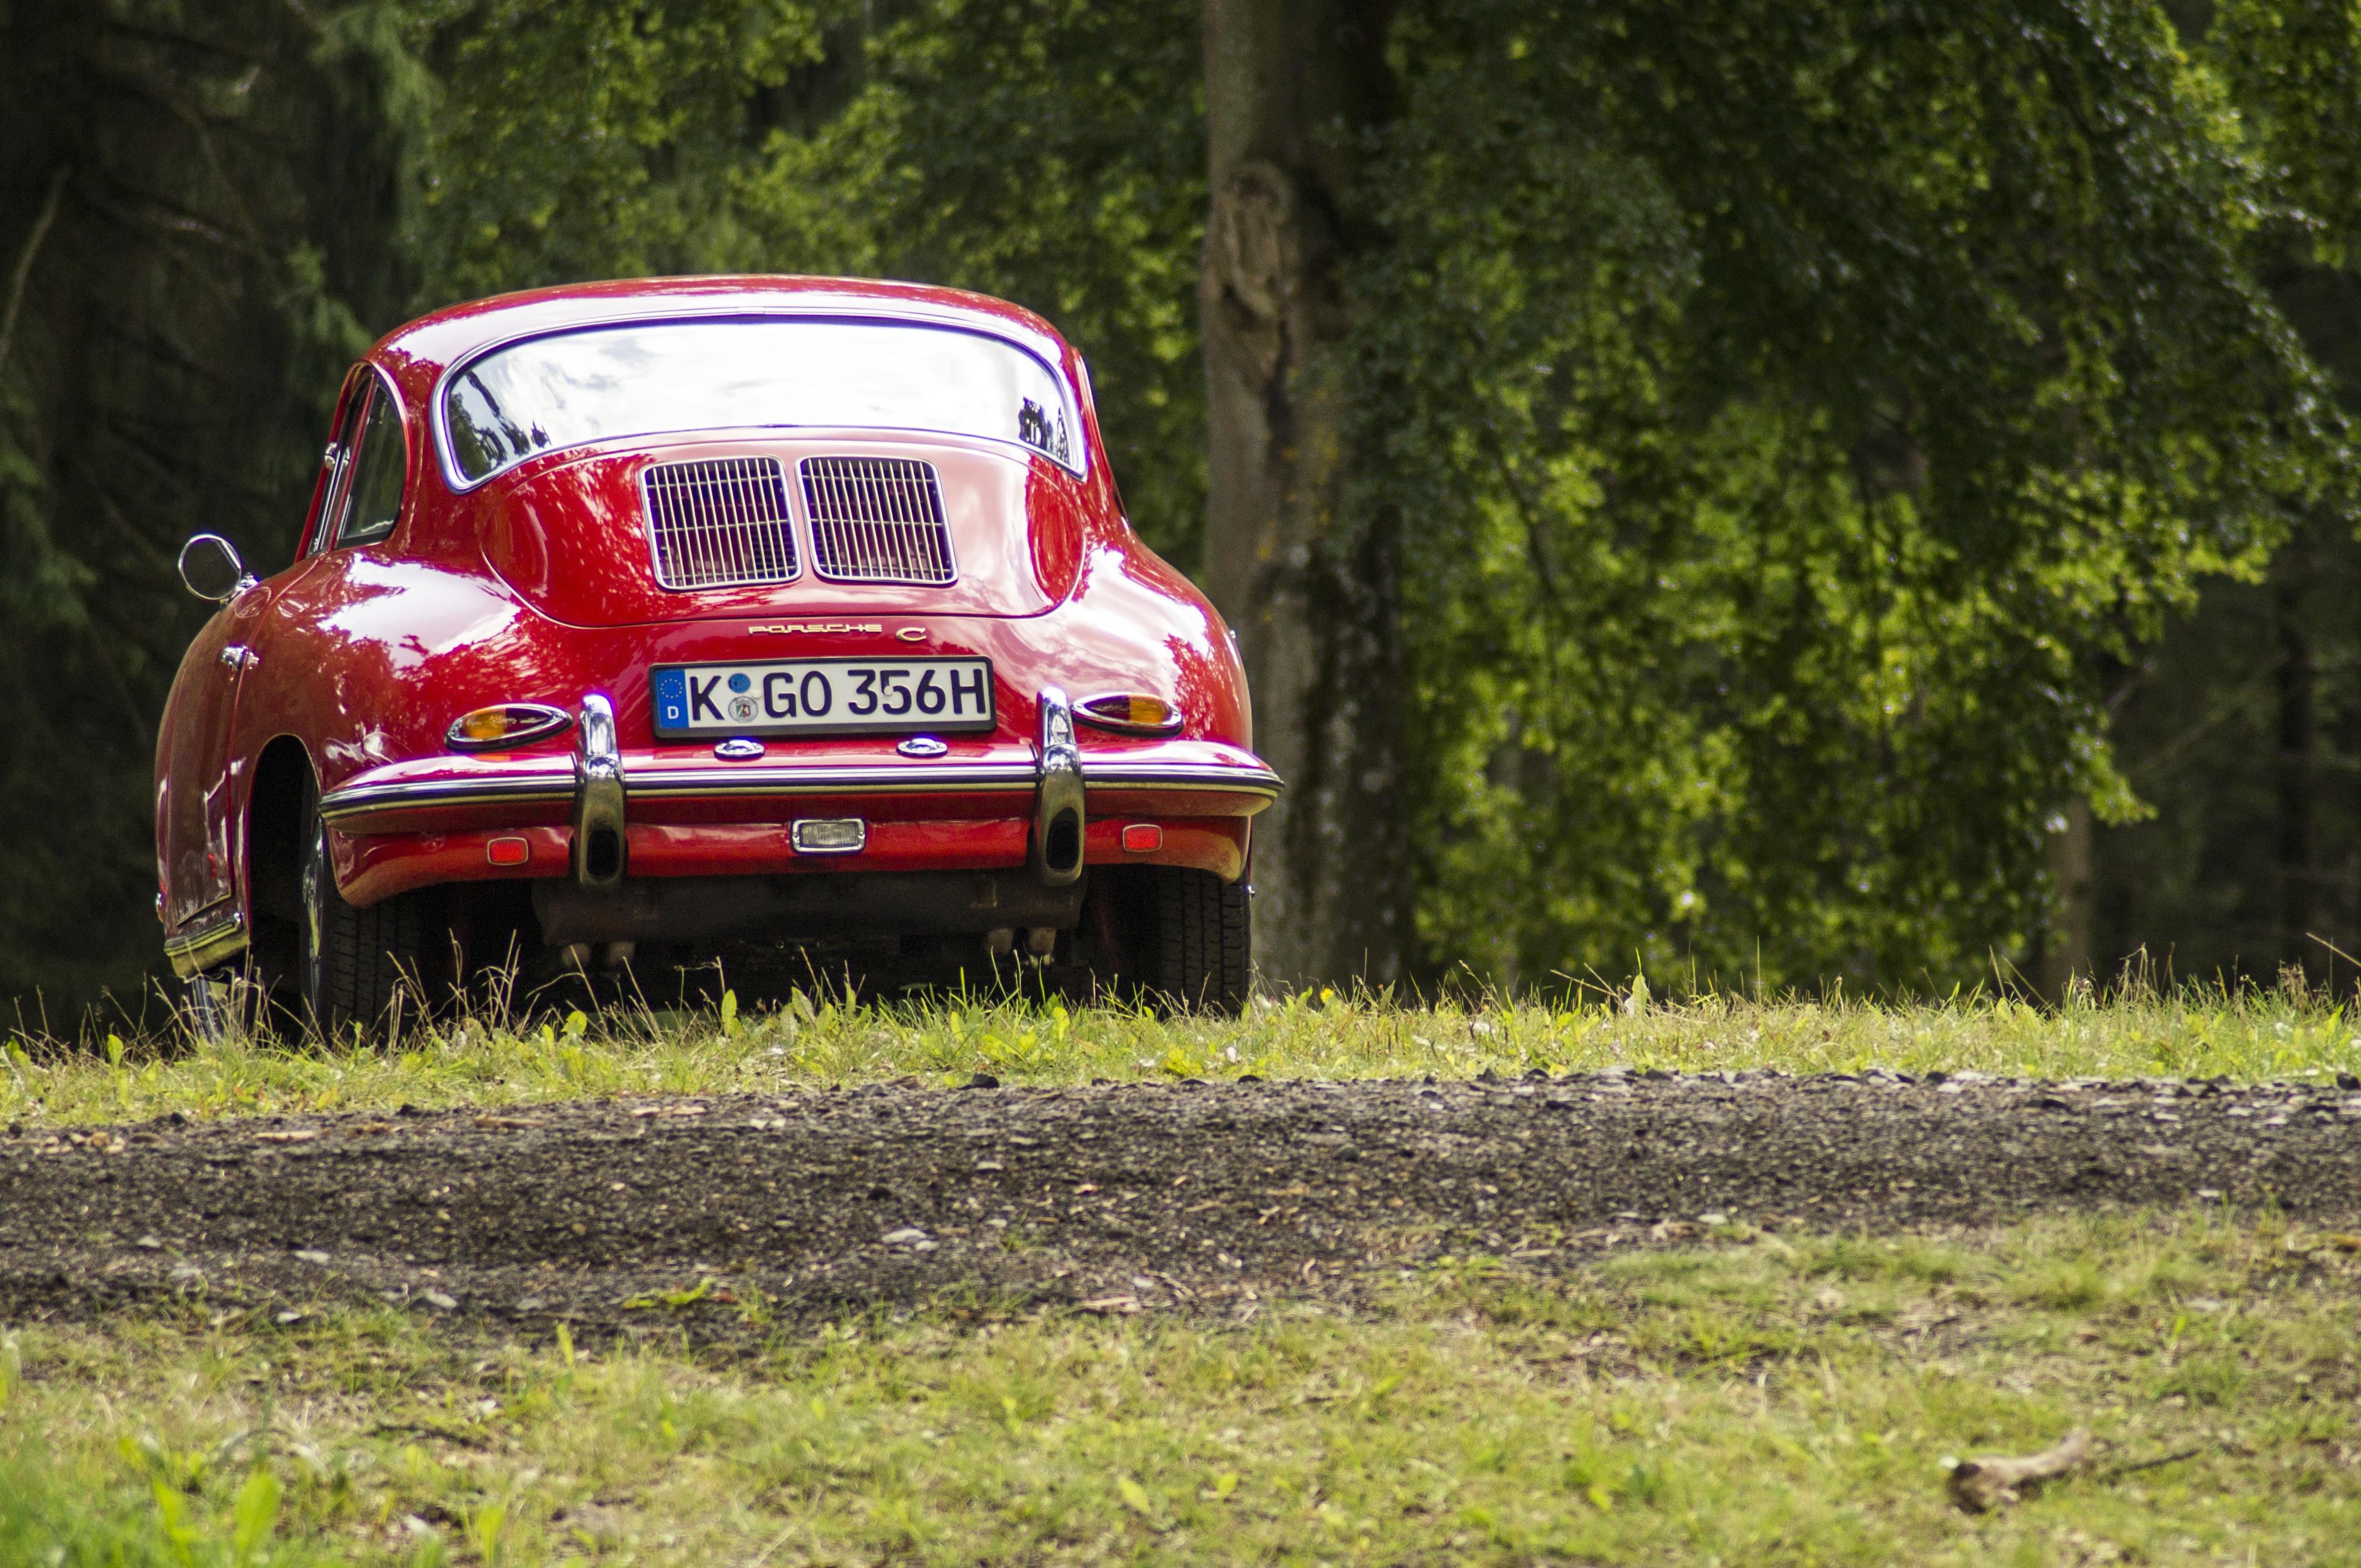 Free Images Antique Wheel Driving Urban Red Club Sports Car - Classic car showcase